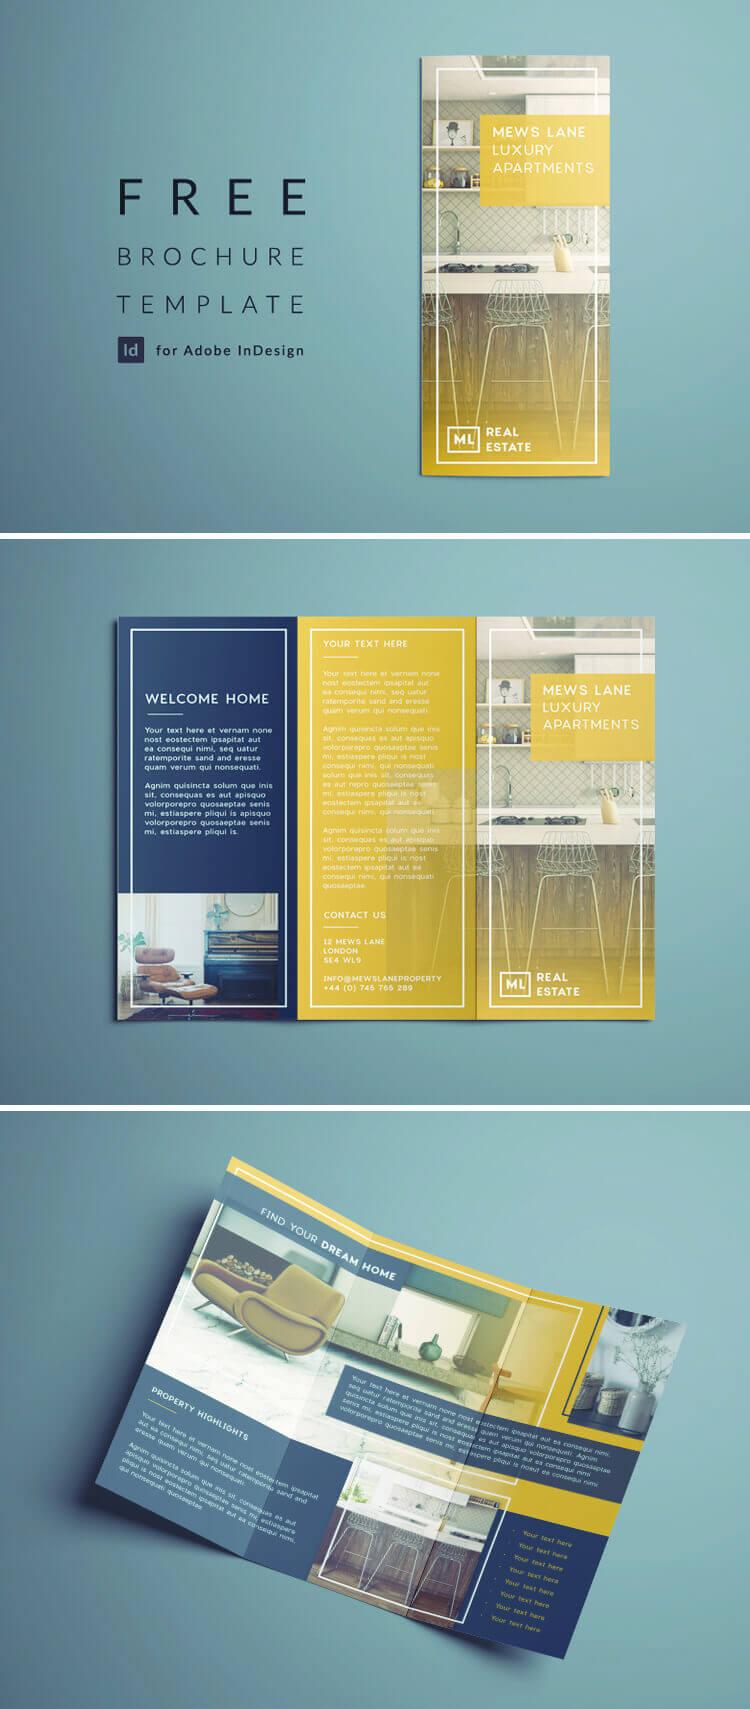 Tri Fold Brochure   Free Indesign Template pertaining to Brochure Template Indesign Free Download